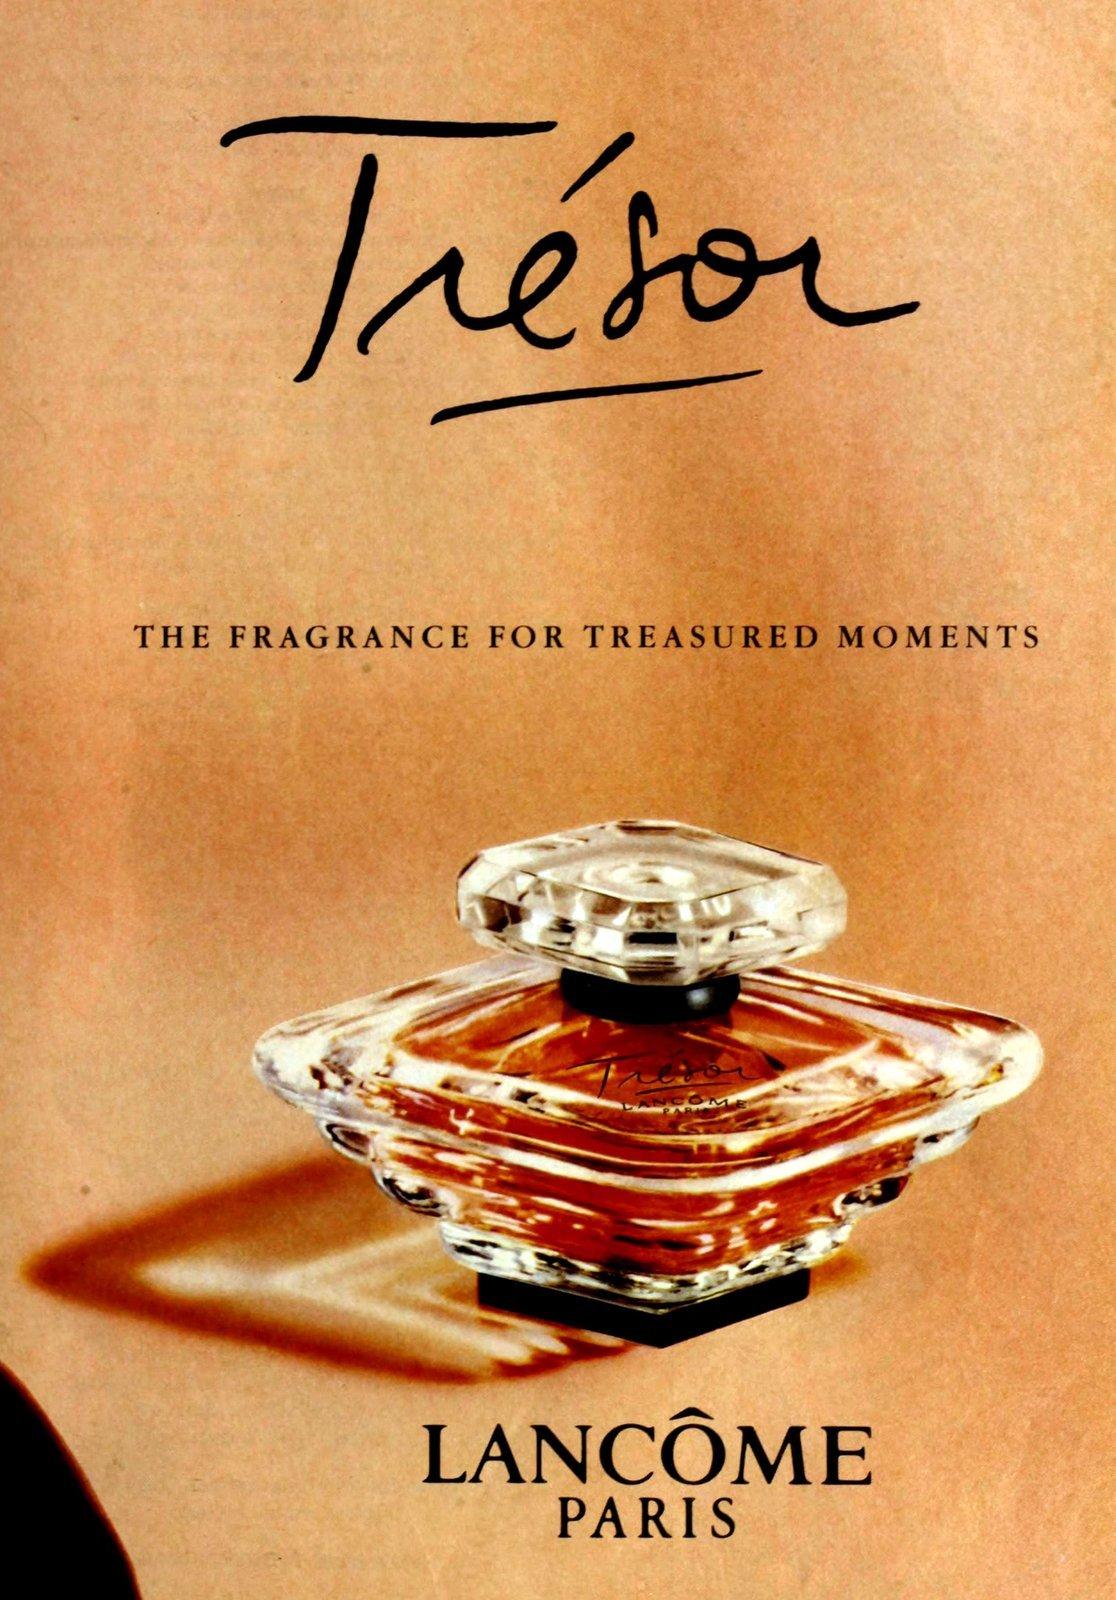 Tresor from Lancome (1993) at ClickAmericana.com